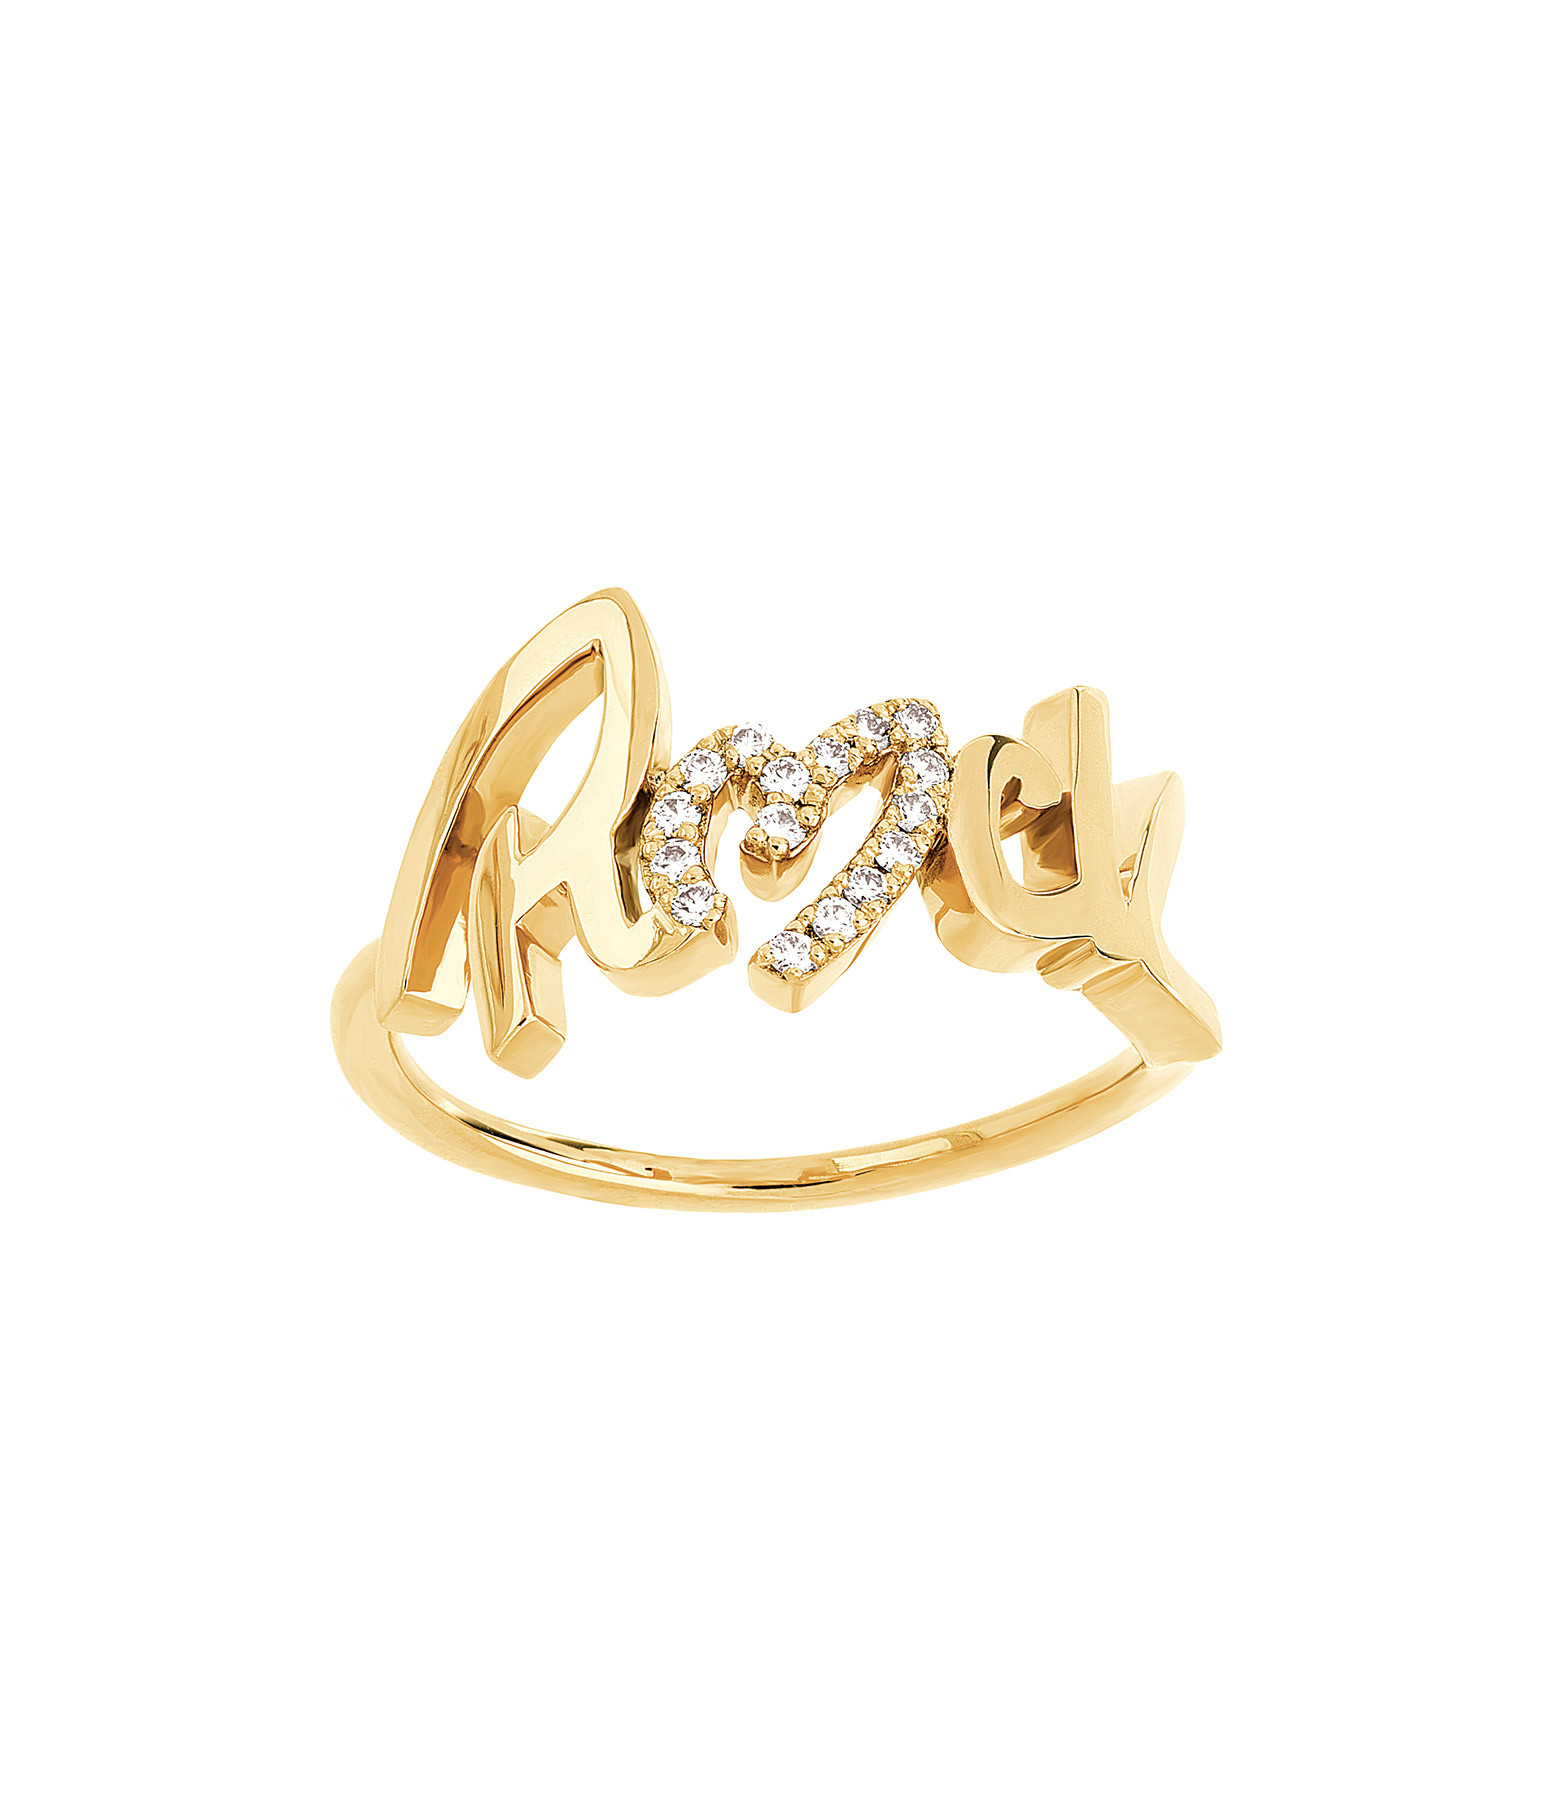 NAVA JOAILLERIE - Bague Rock Diamant Or Jaune